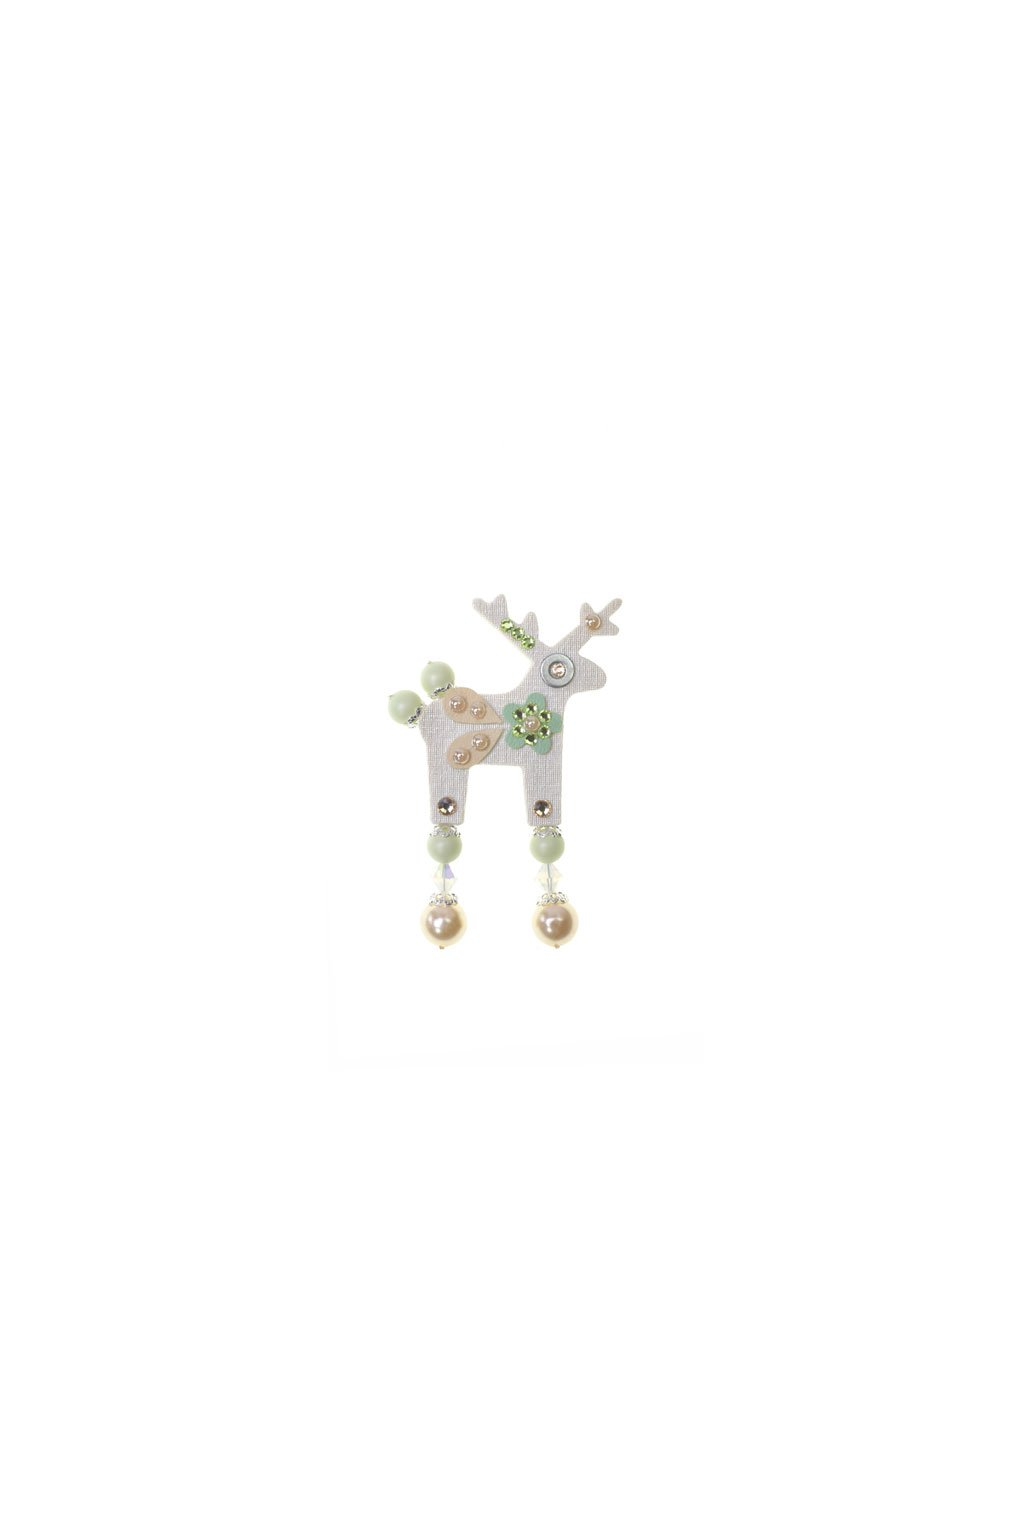 Bílá jelení mini brož